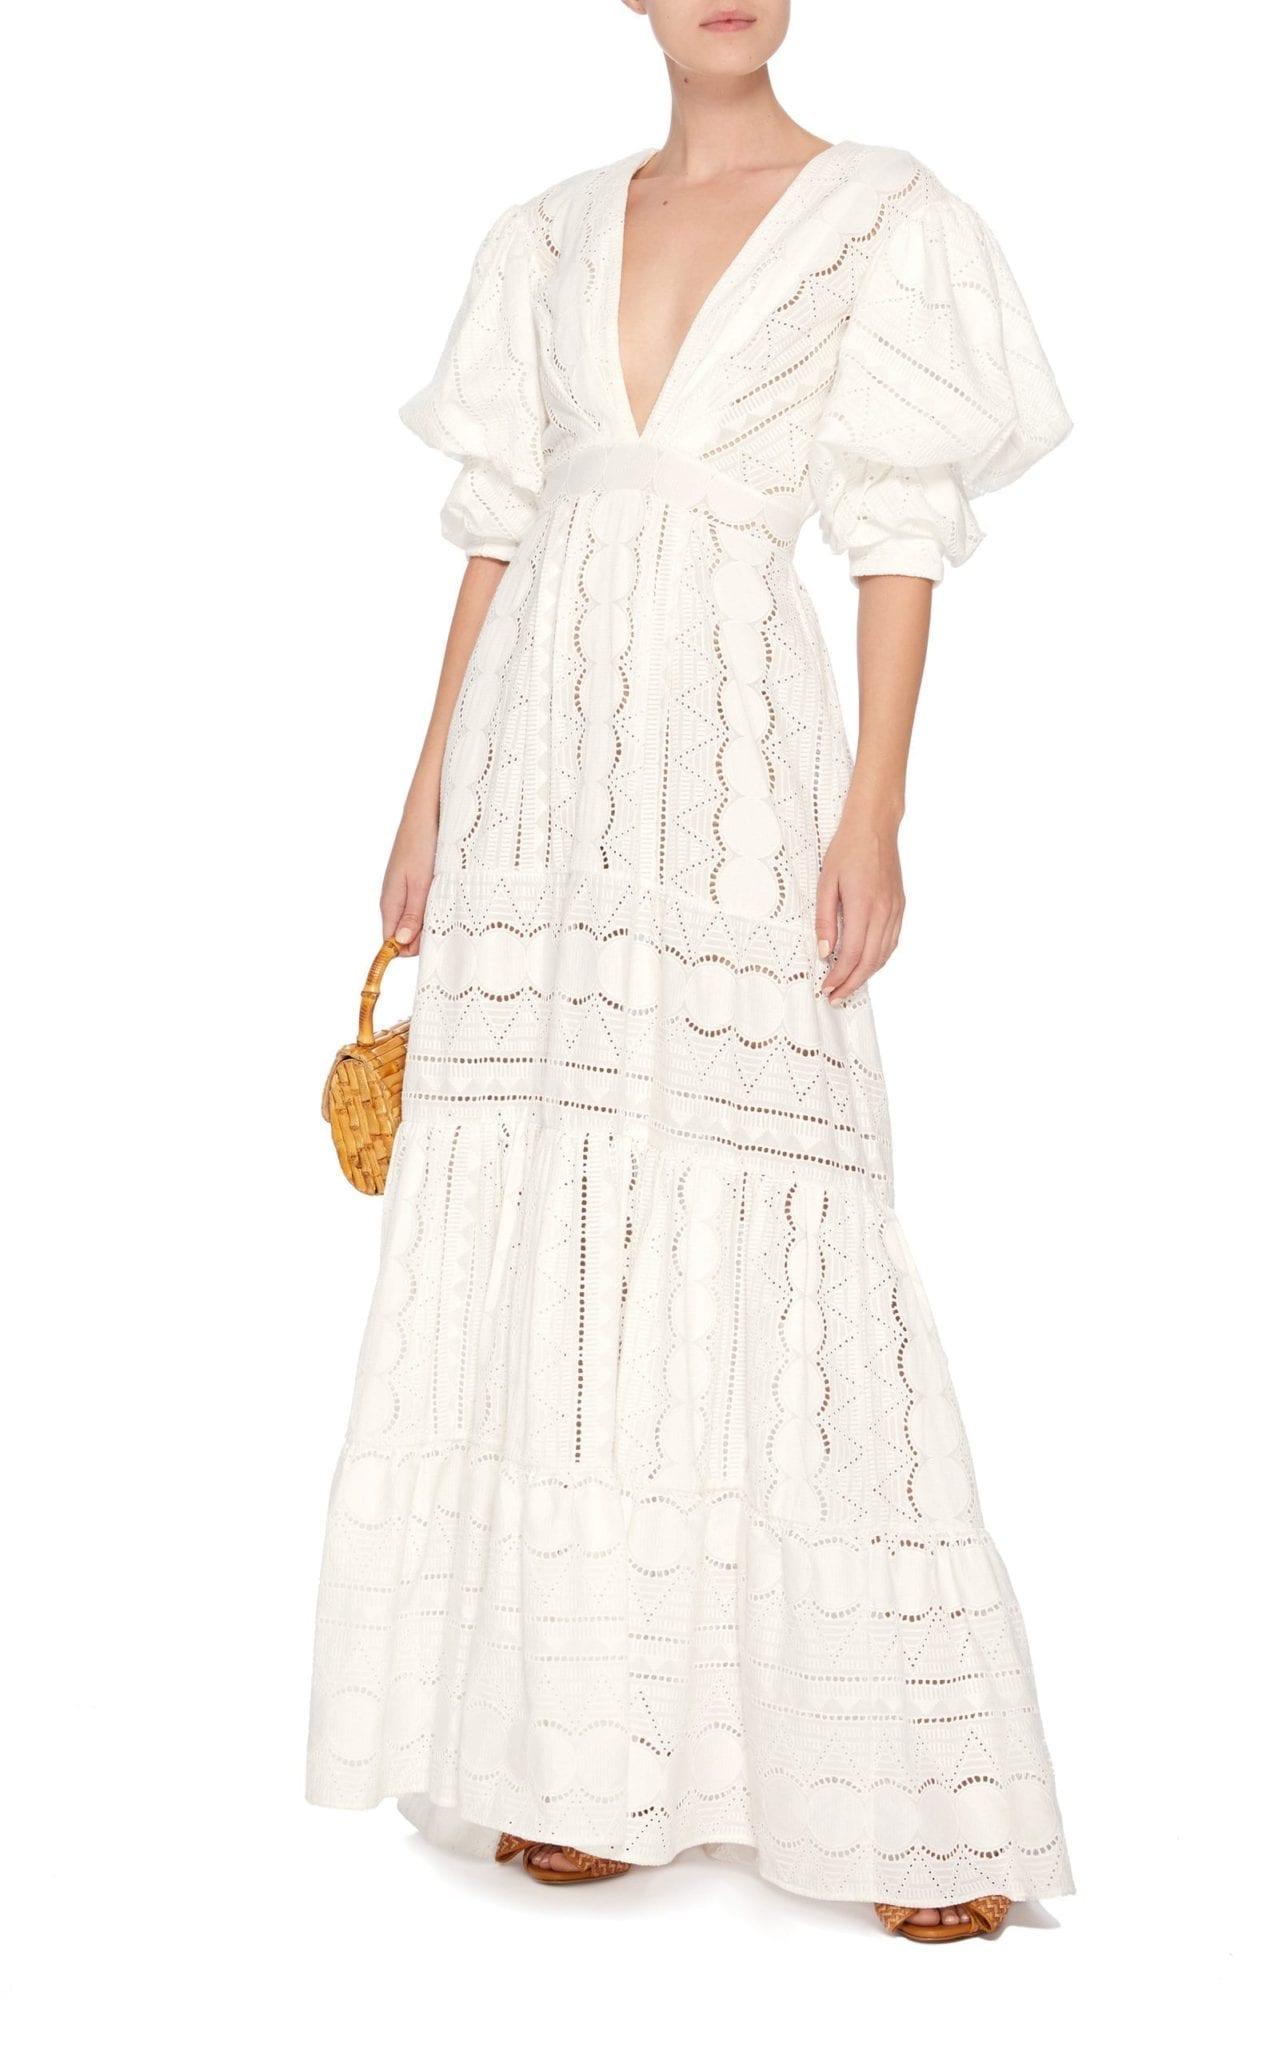 JOHANNA ORTIZ M'O Exclusive Mademoiselle Sophie Cotton Eyelet White Dress